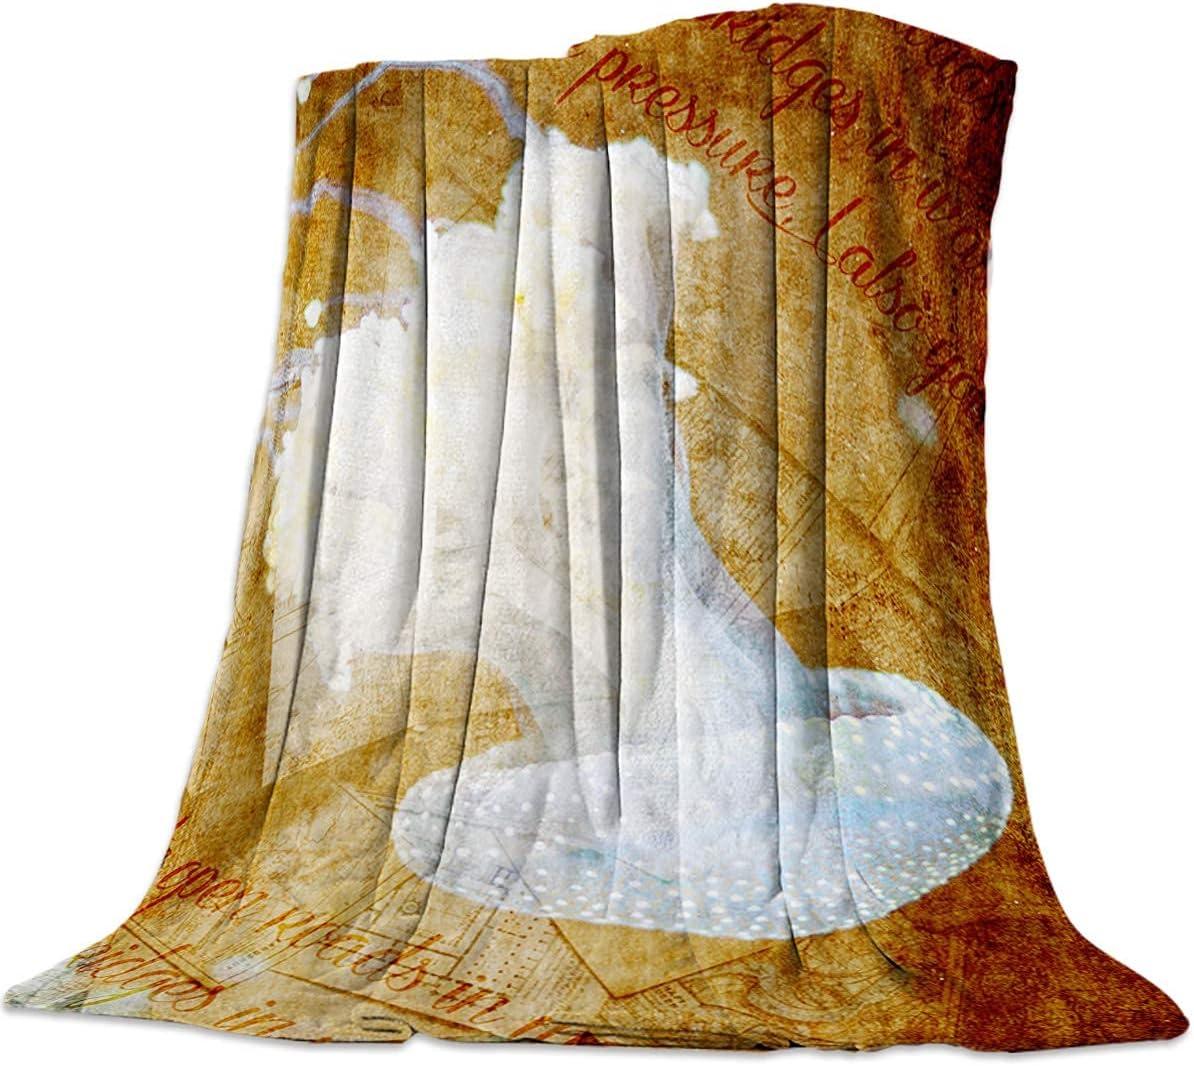 Popular brand in Regular discount the world Throw Blanket Warm Microfiber Plush Fleece Fuzzy Flannel